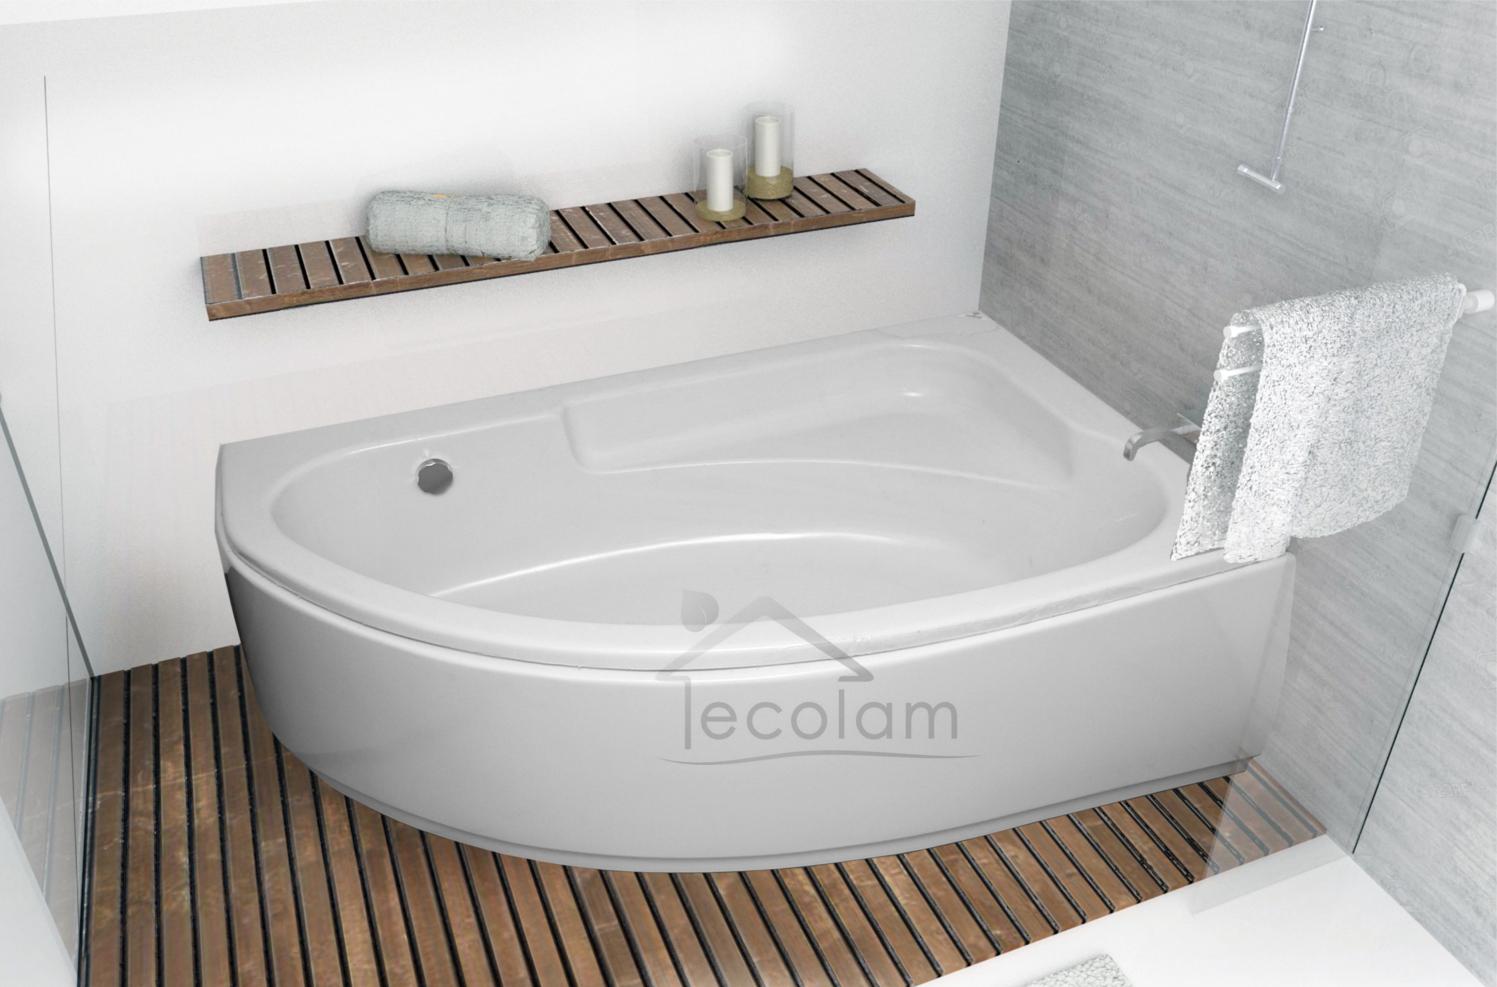 badewanne wanne eckwanne acryl 175 x 110 cm sch rze f e. Black Bedroom Furniture Sets. Home Design Ideas